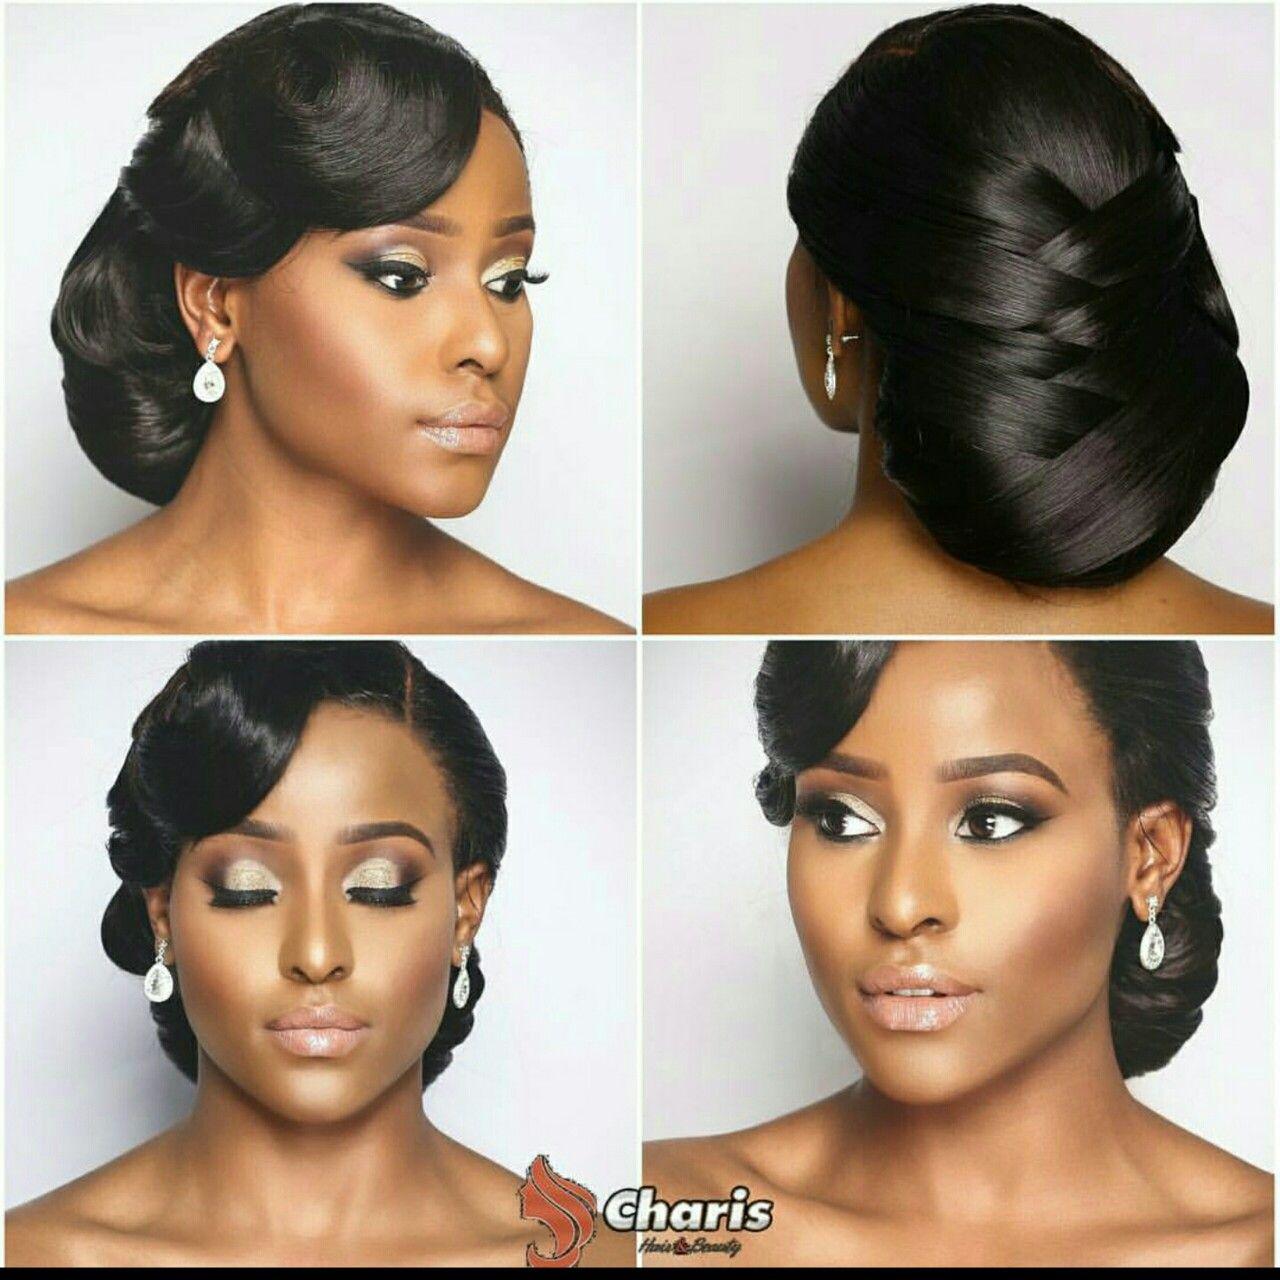 My Beautiful Cousin Looking So Gorgeous Modern Bridal Hairstyles Hairdo Wedding Black Wedding Hairstyles